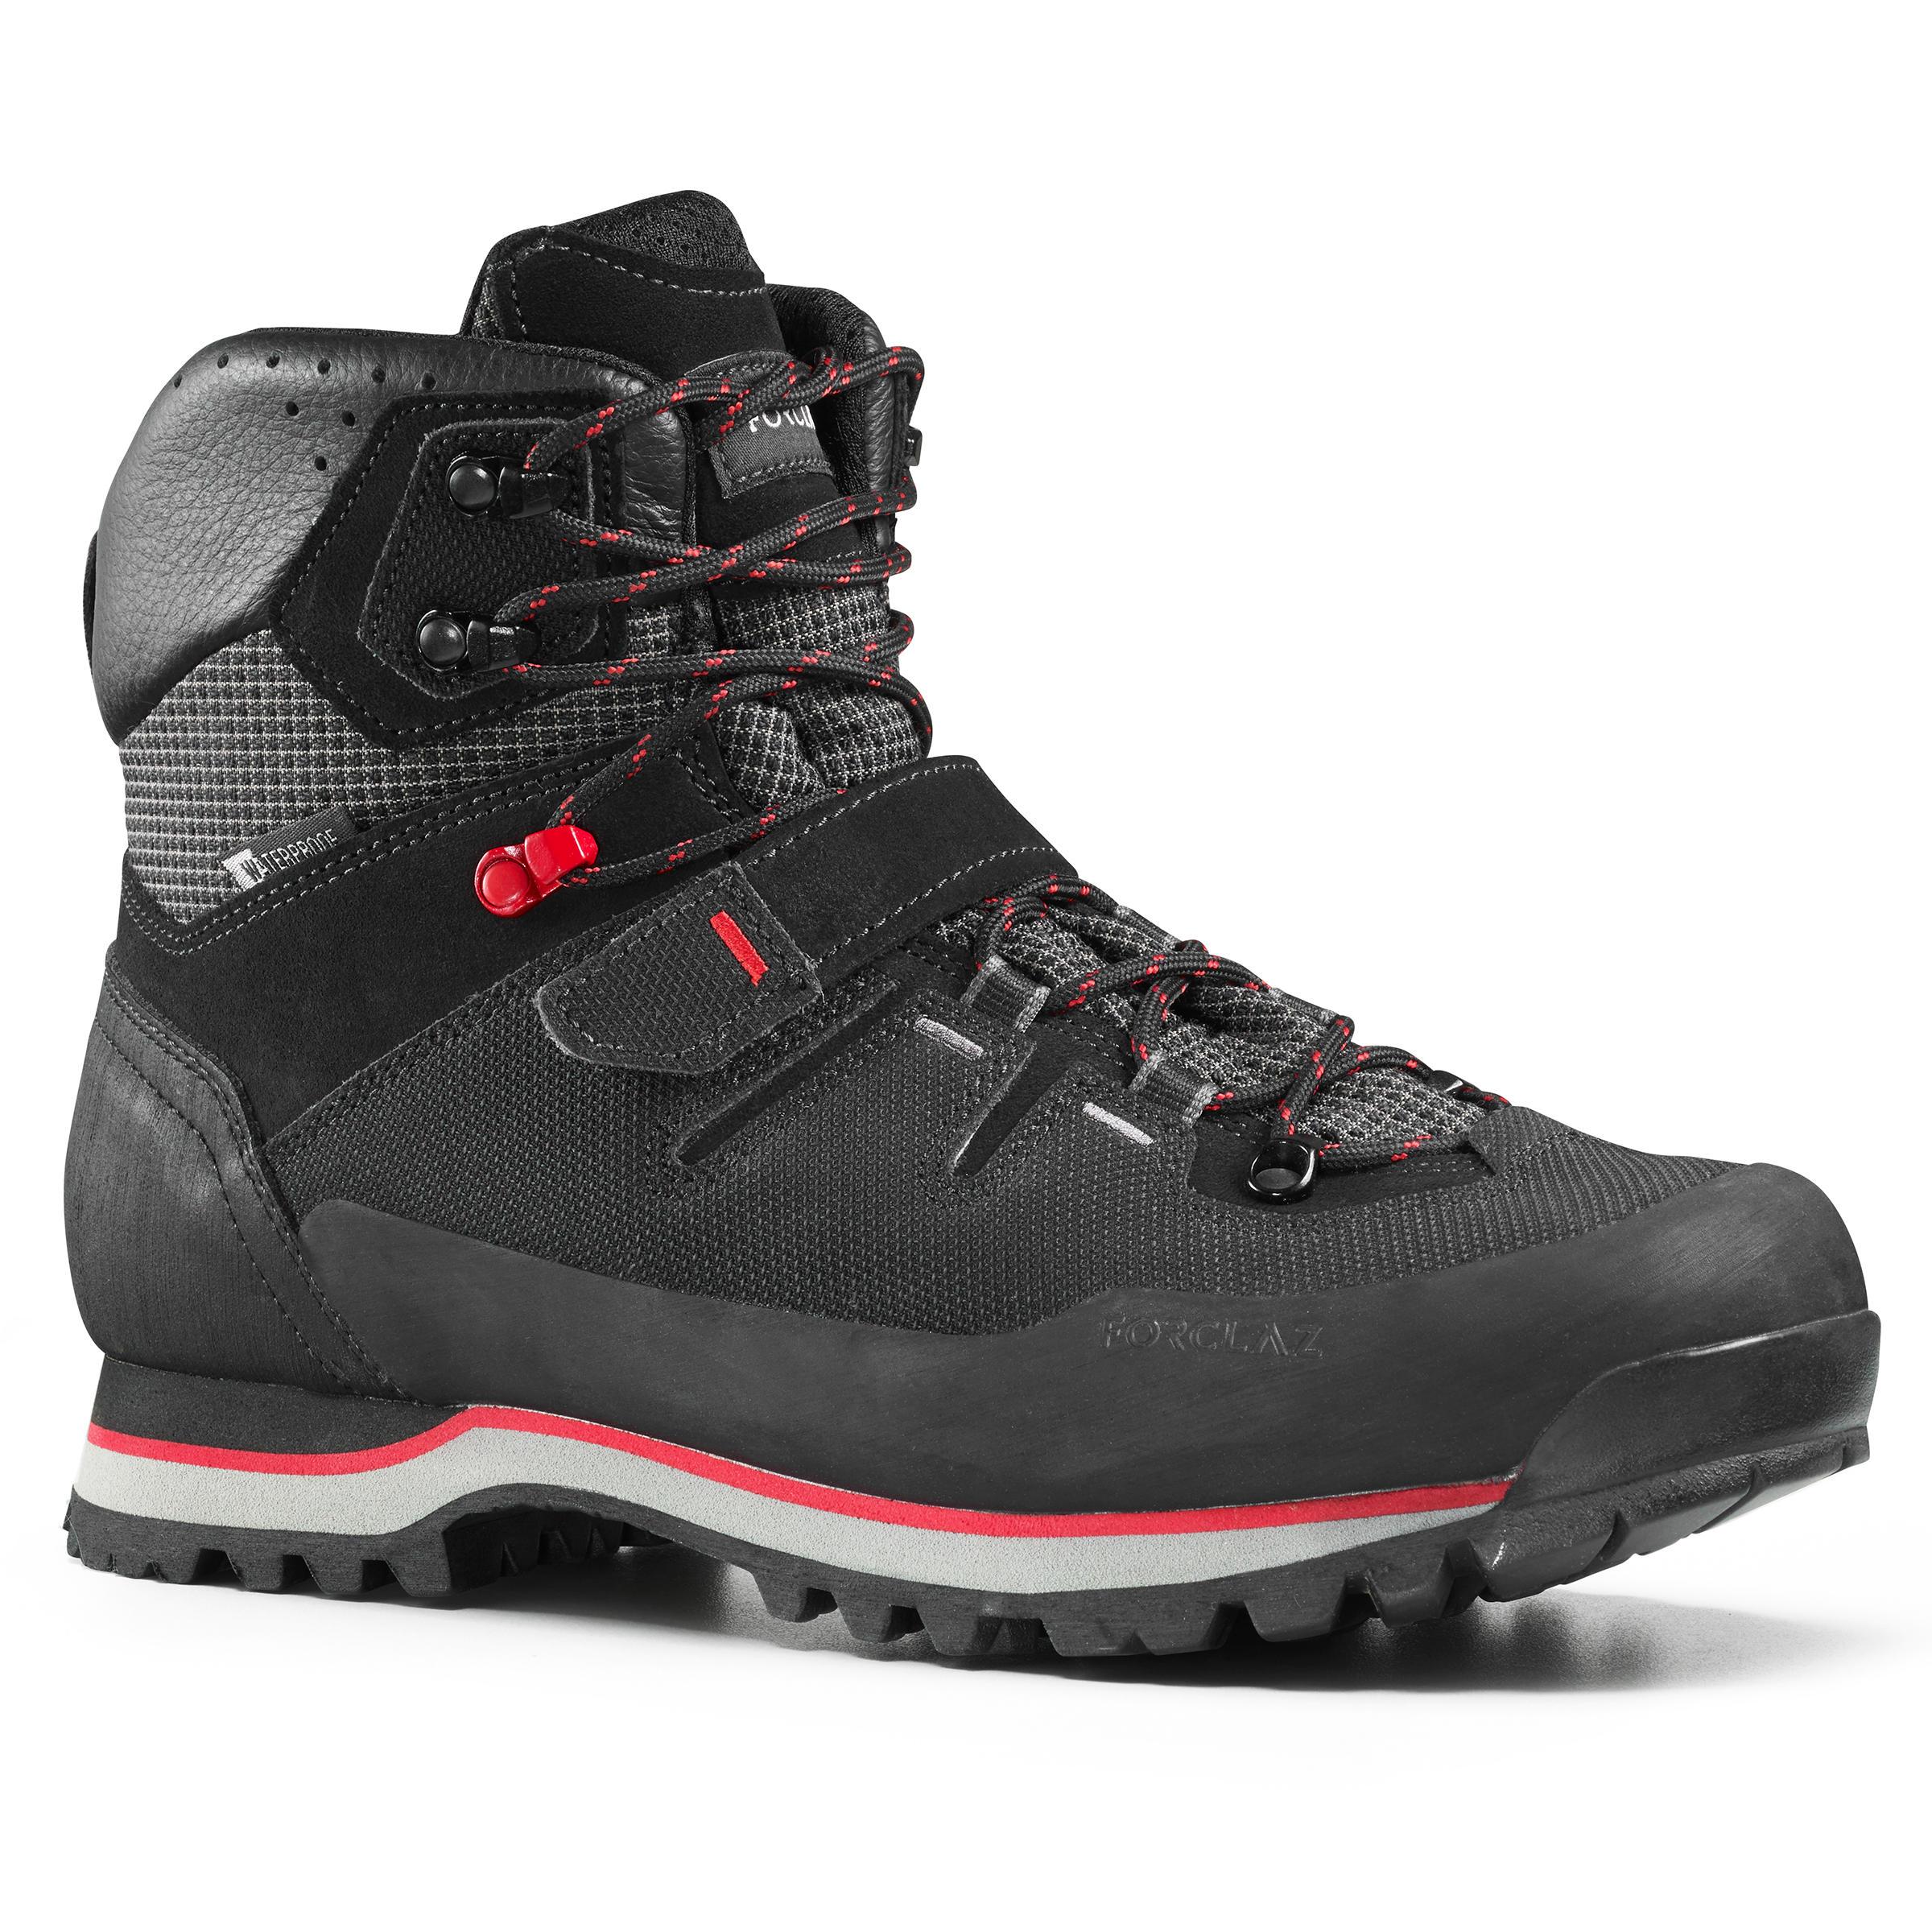 Chaussures de trekking montagne TREK700 homme - Forclaz